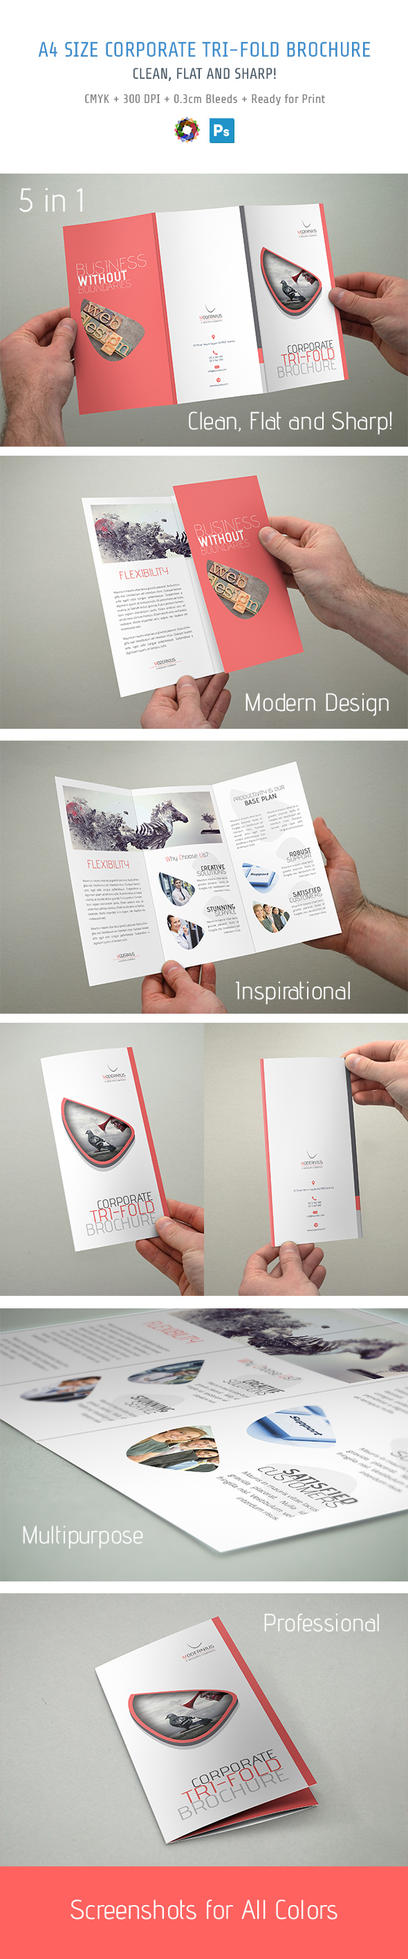 Modern Trifold Brochure by bakirci